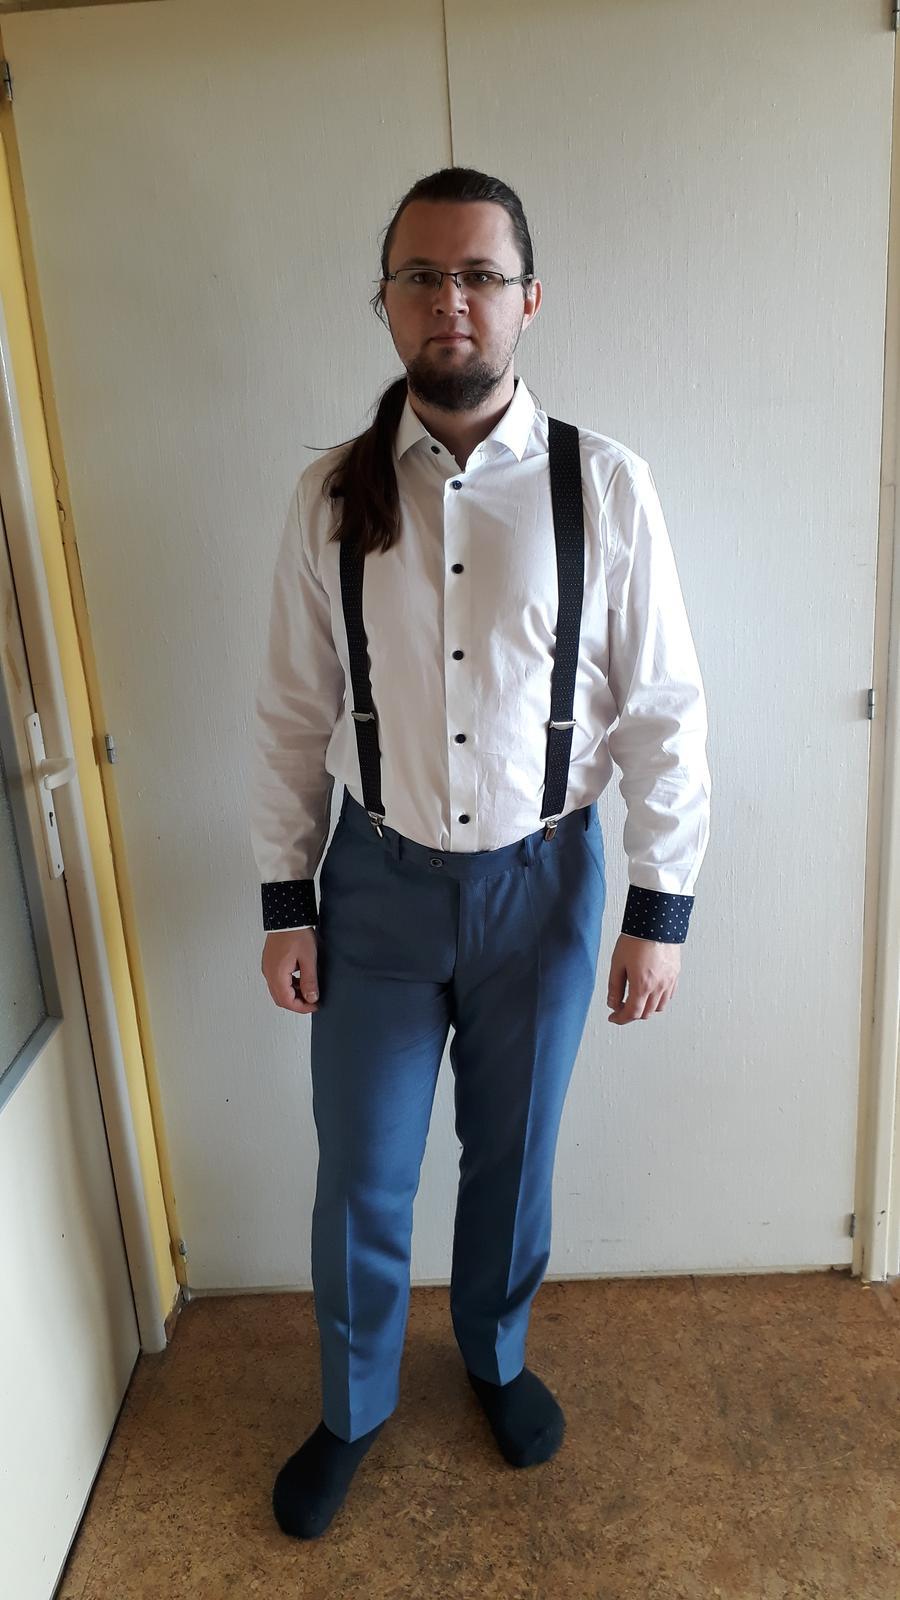 Co uz mame... - Dali byste ksandy? Nebo kravatu? Bez toho mi to prijde takove divne...ale mame jeste teda hnedy pasek a boty ;-)